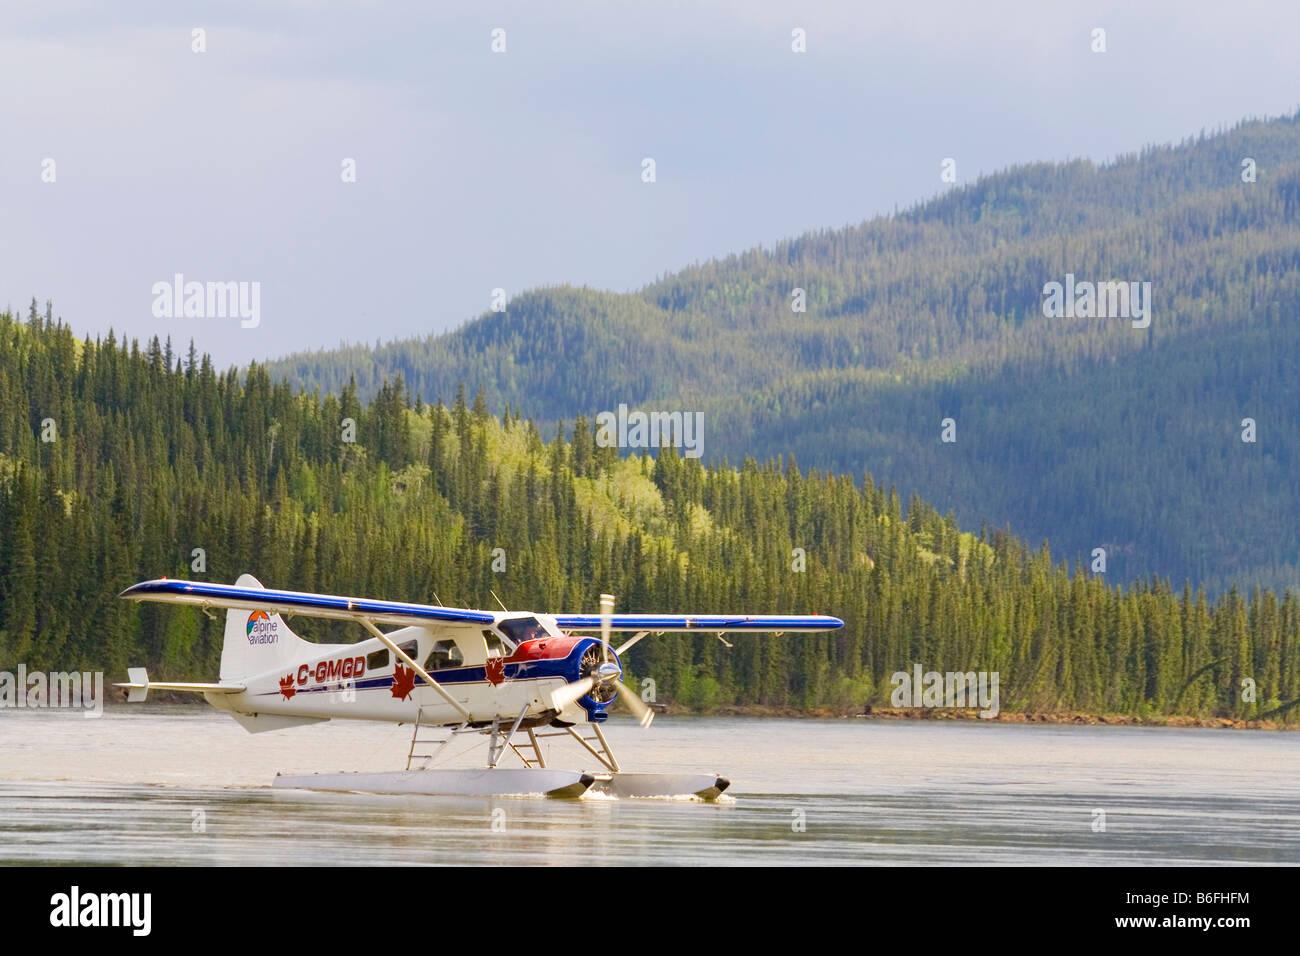 Taxiing, legendary de Havilland Canada DHC-2 Beaver, float plane, bush plane, Yukon River, Teslin River, Hootalinqua, - Stock Image